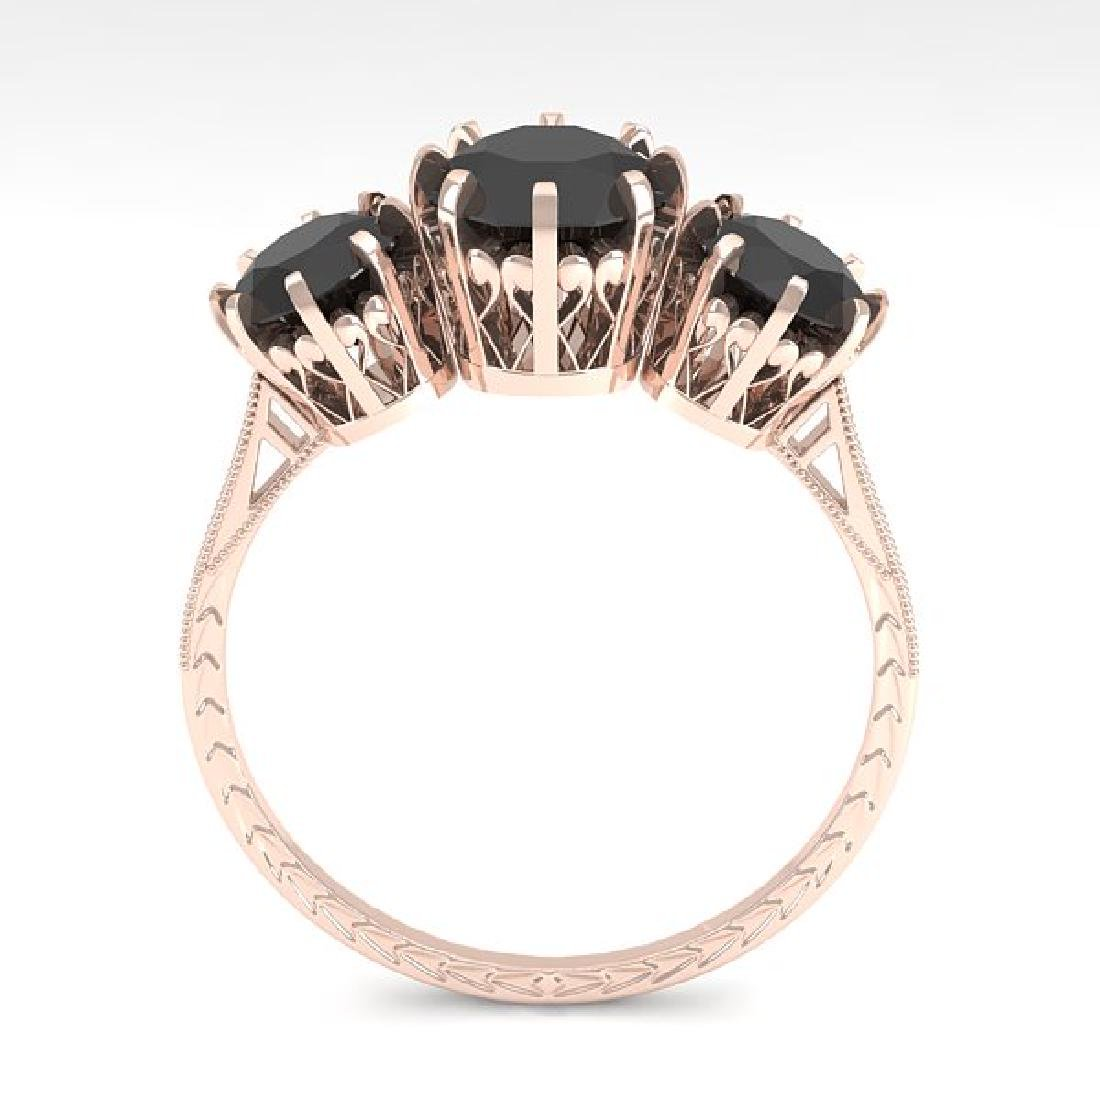 2 CTW Black Diamond Ring 14K Rose Gold - 3